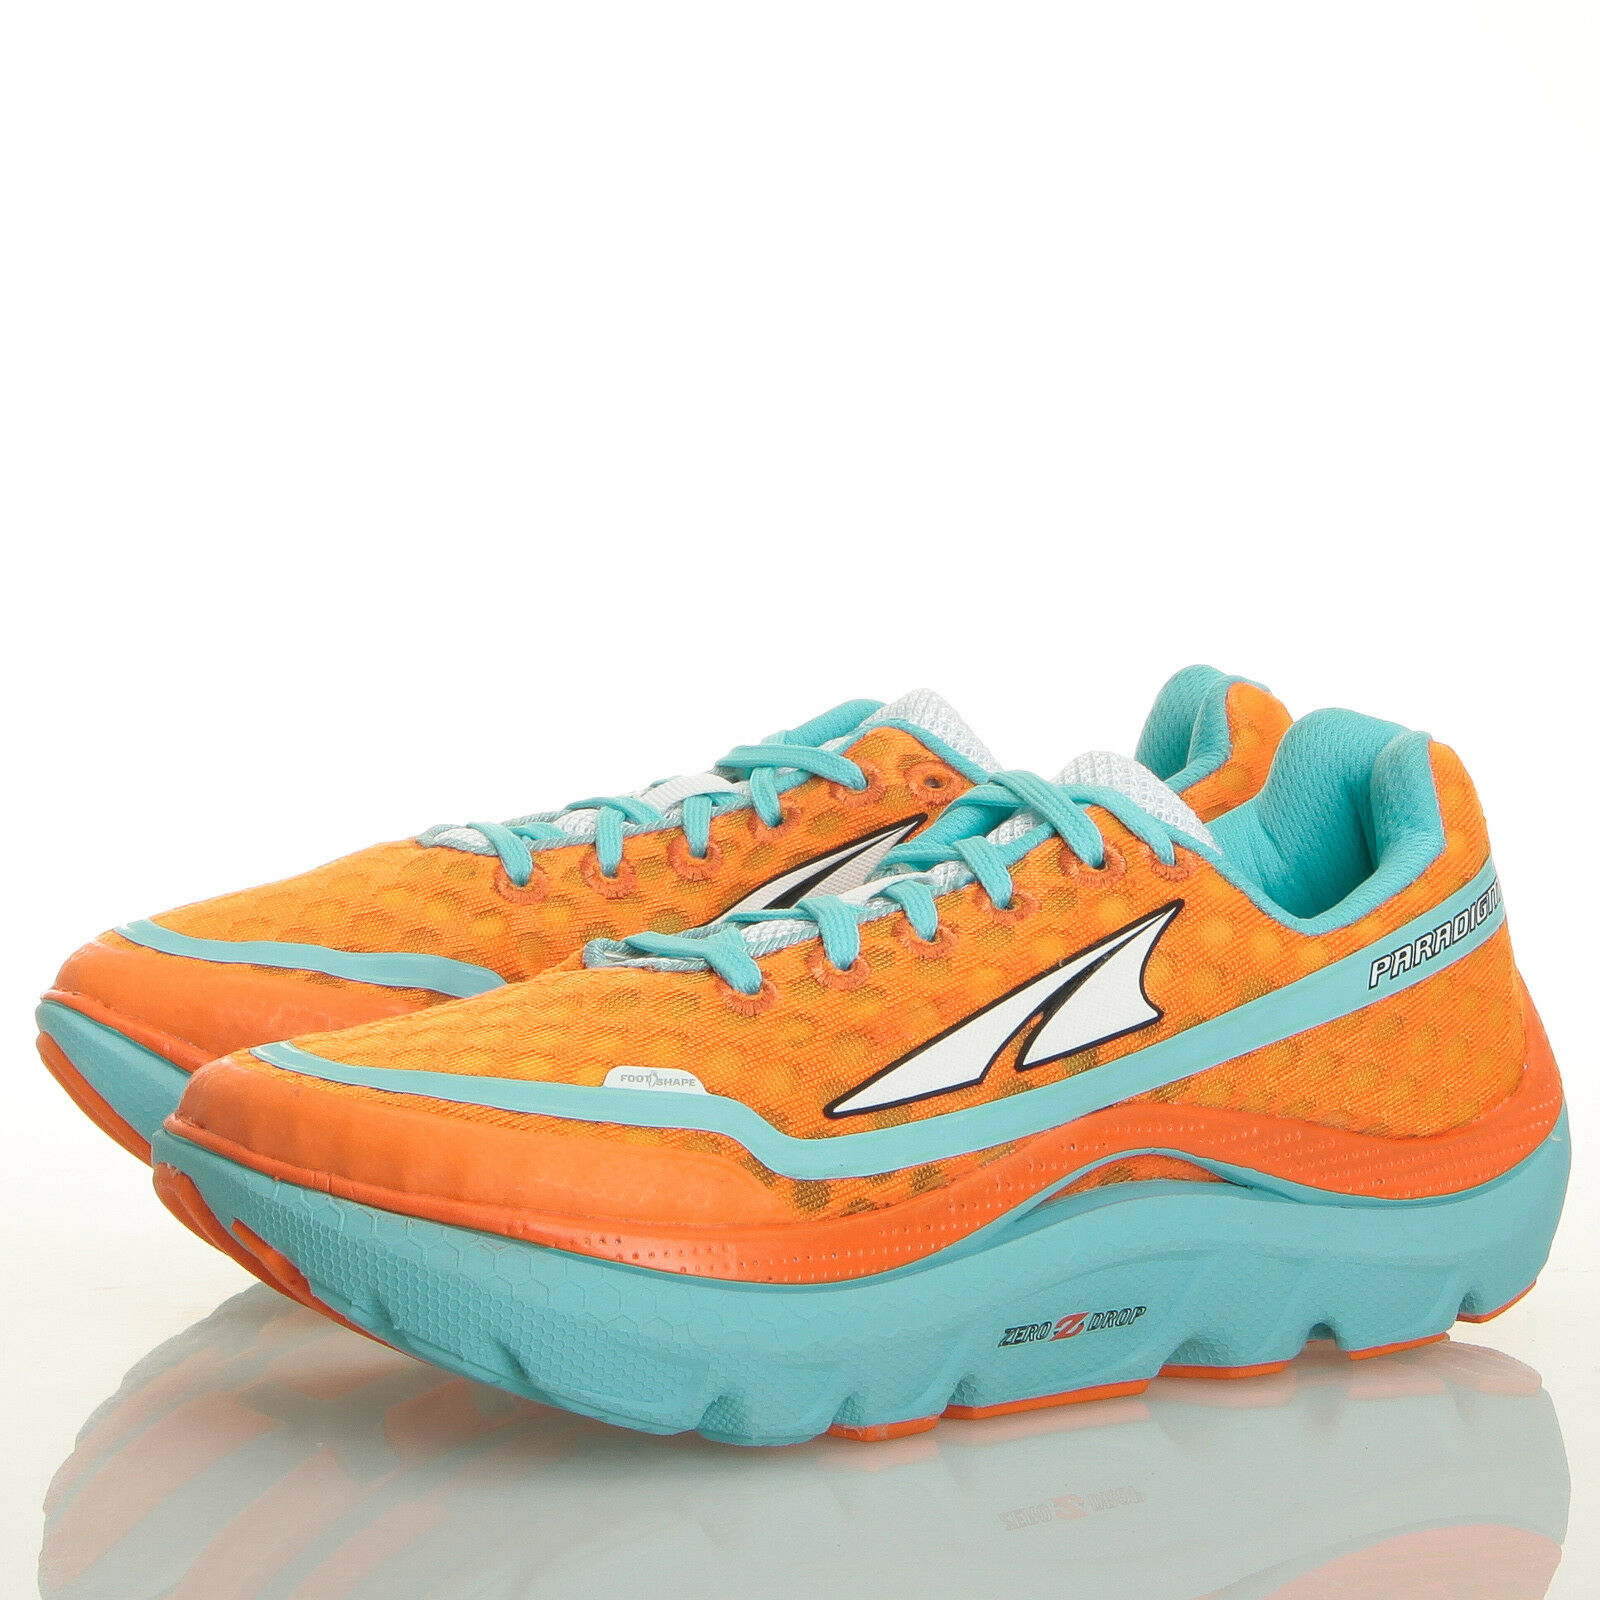 Altra paradigma de caída cero 1.5 Naranja Mandarina Zapatillas Para Para Para Correr-Para Mujer 5.5 31ea02